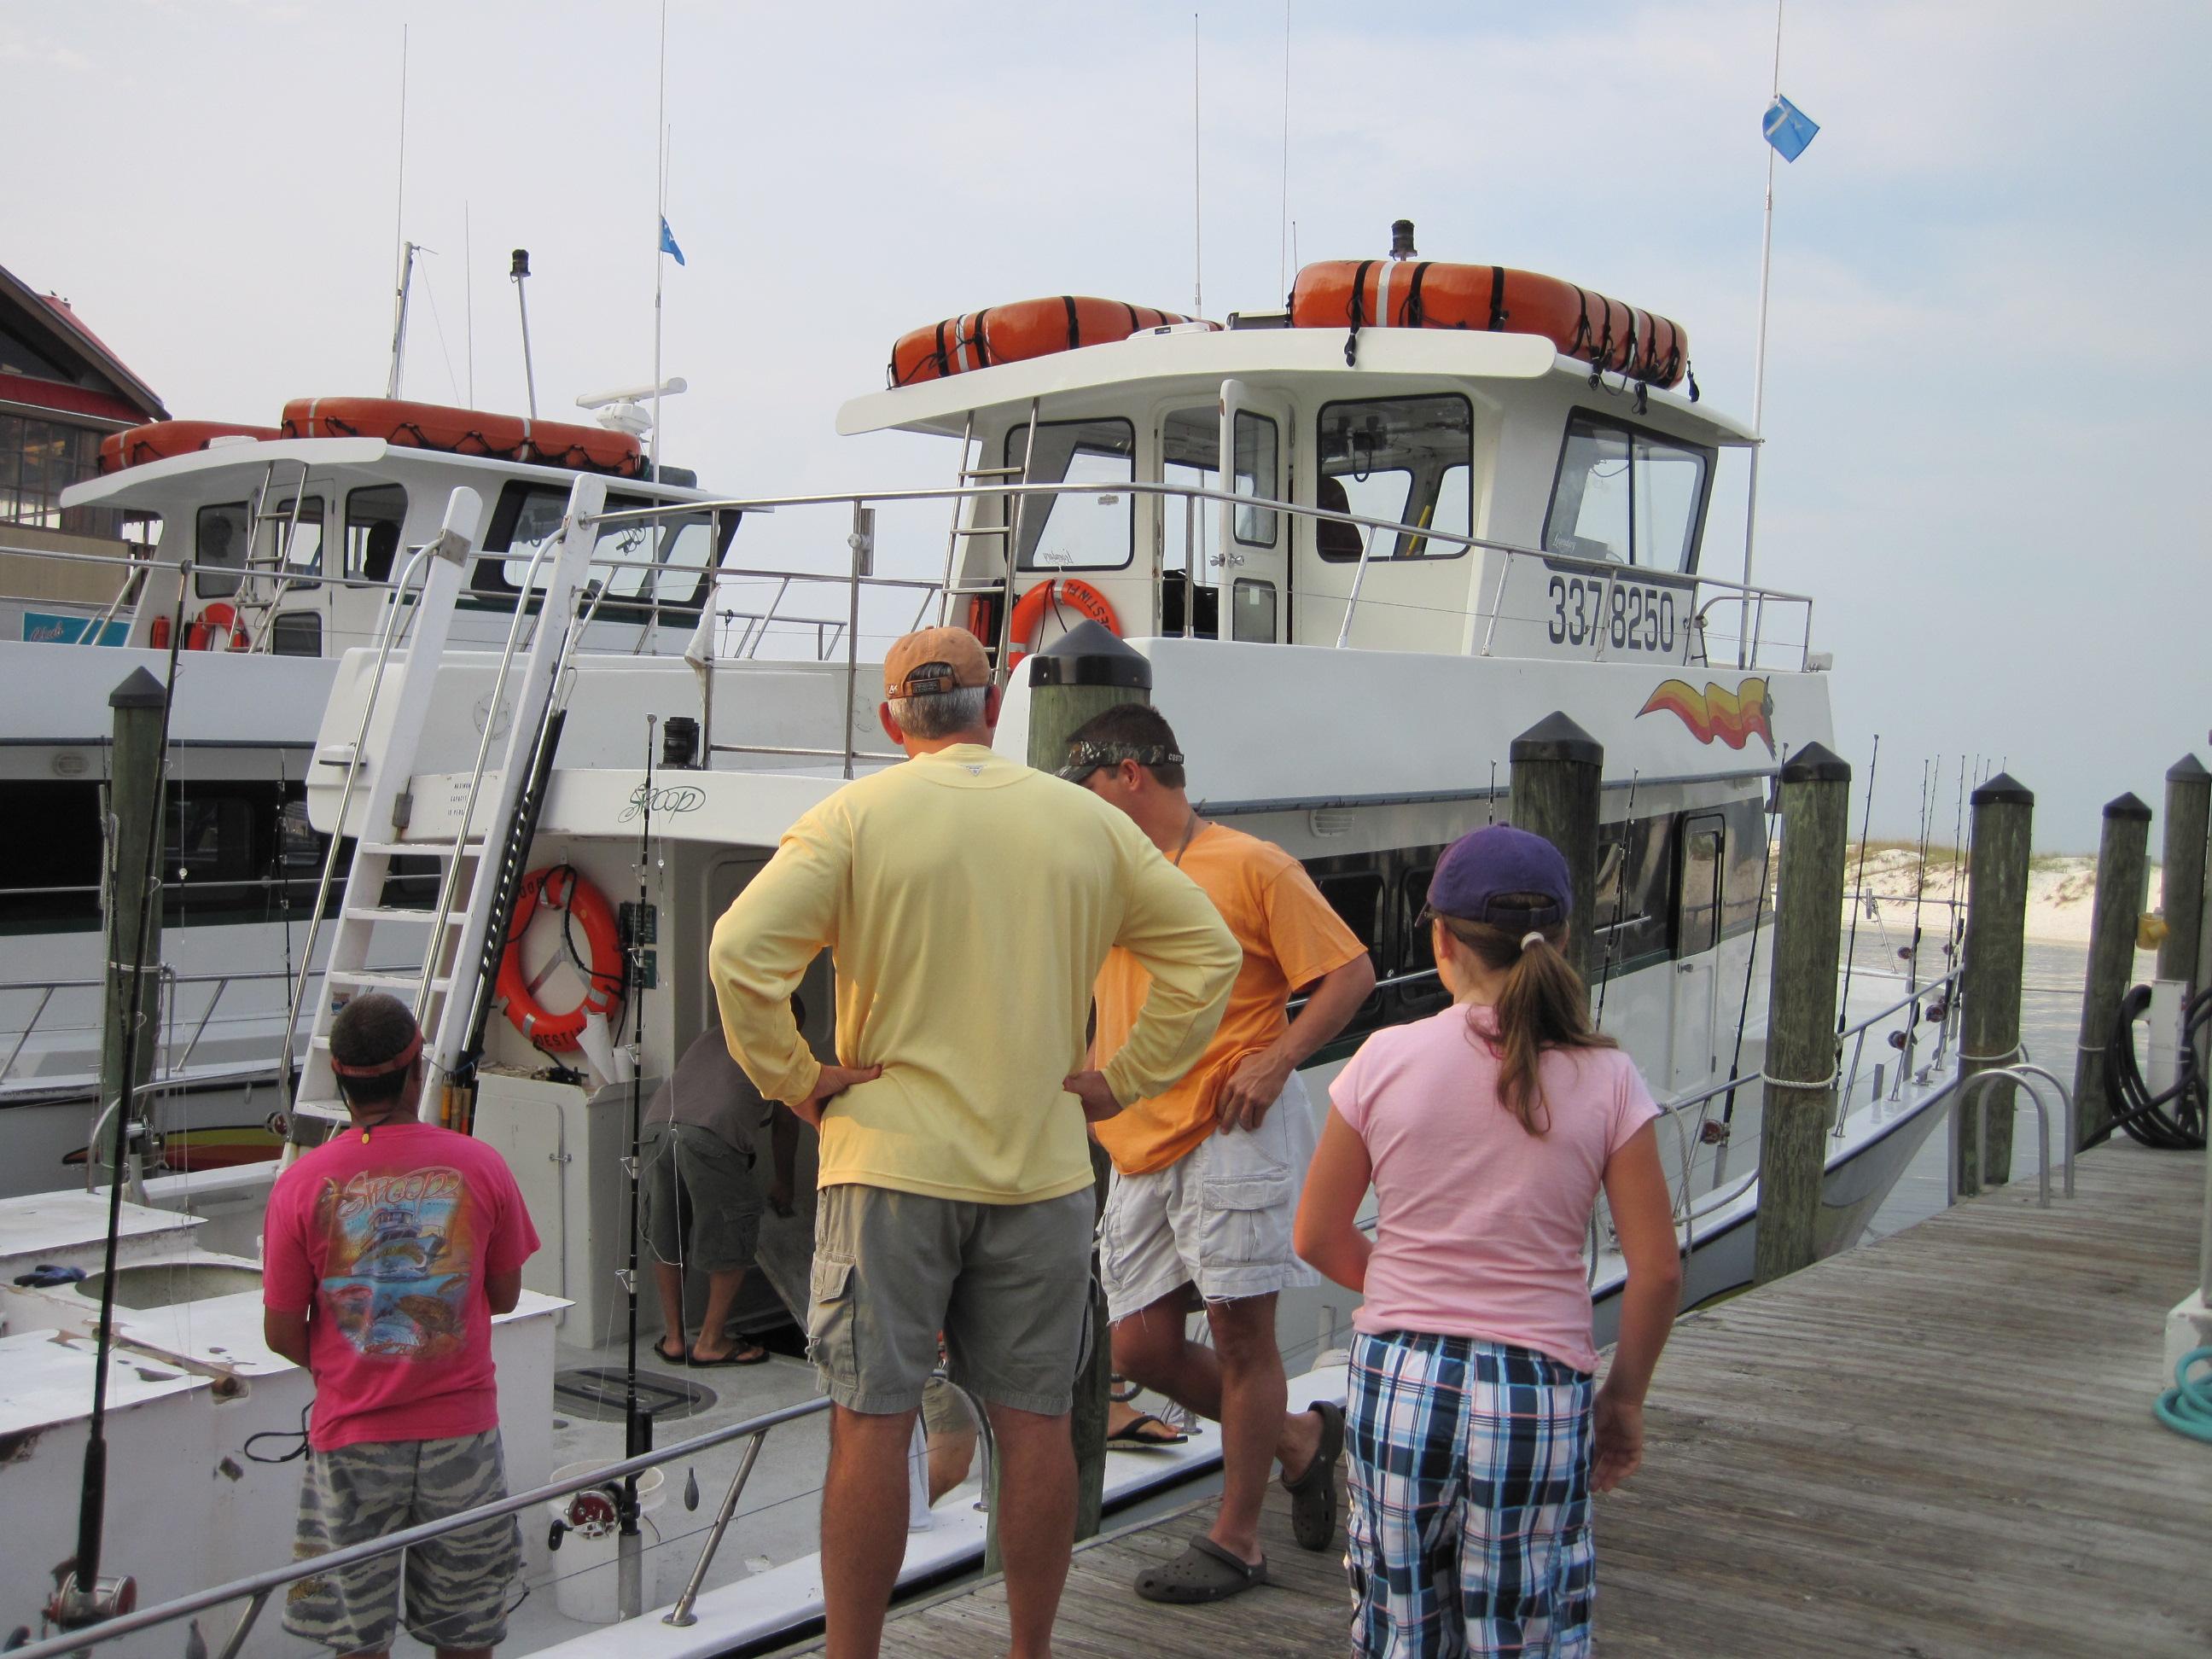 Deep sea fishing with swoop charters in destin fl for Destin florida fishing trips